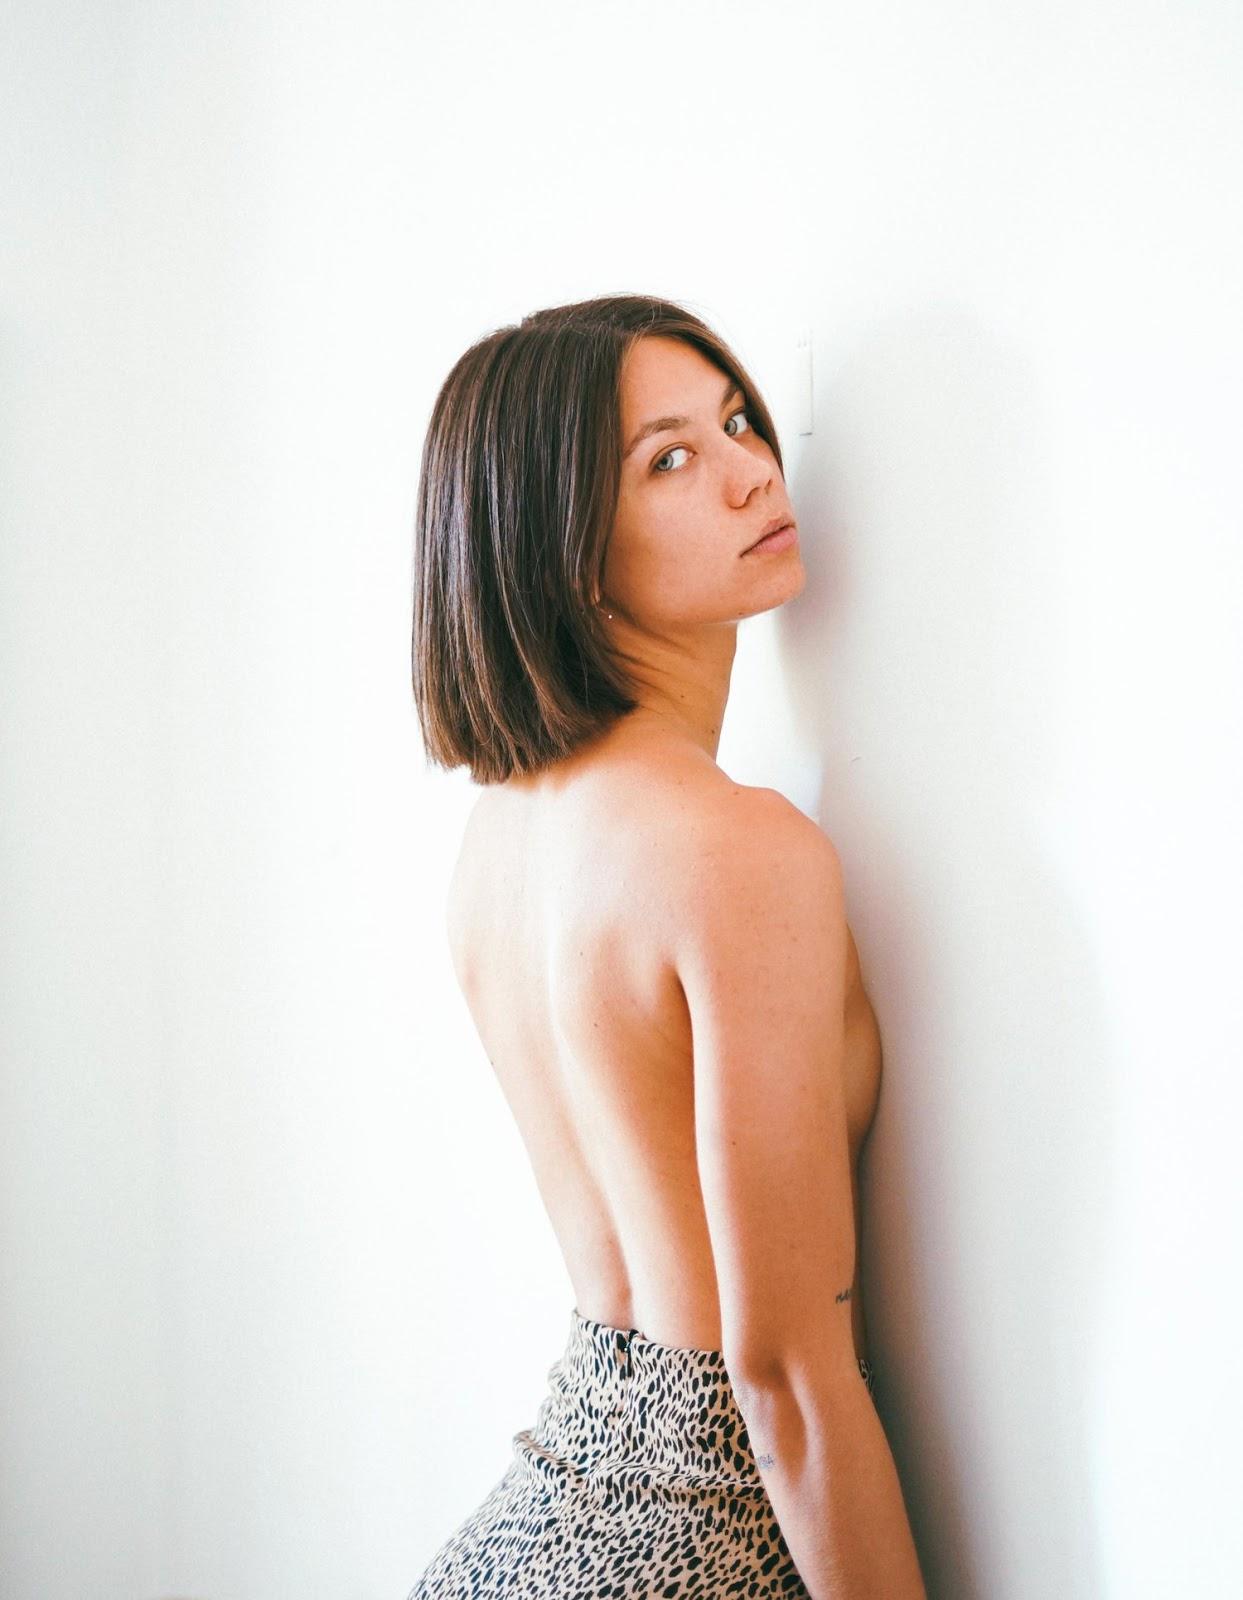 Amanda Rosa Desnuda En H Extremo a sexy corner: clementina aliberti desnuda para pablo gil